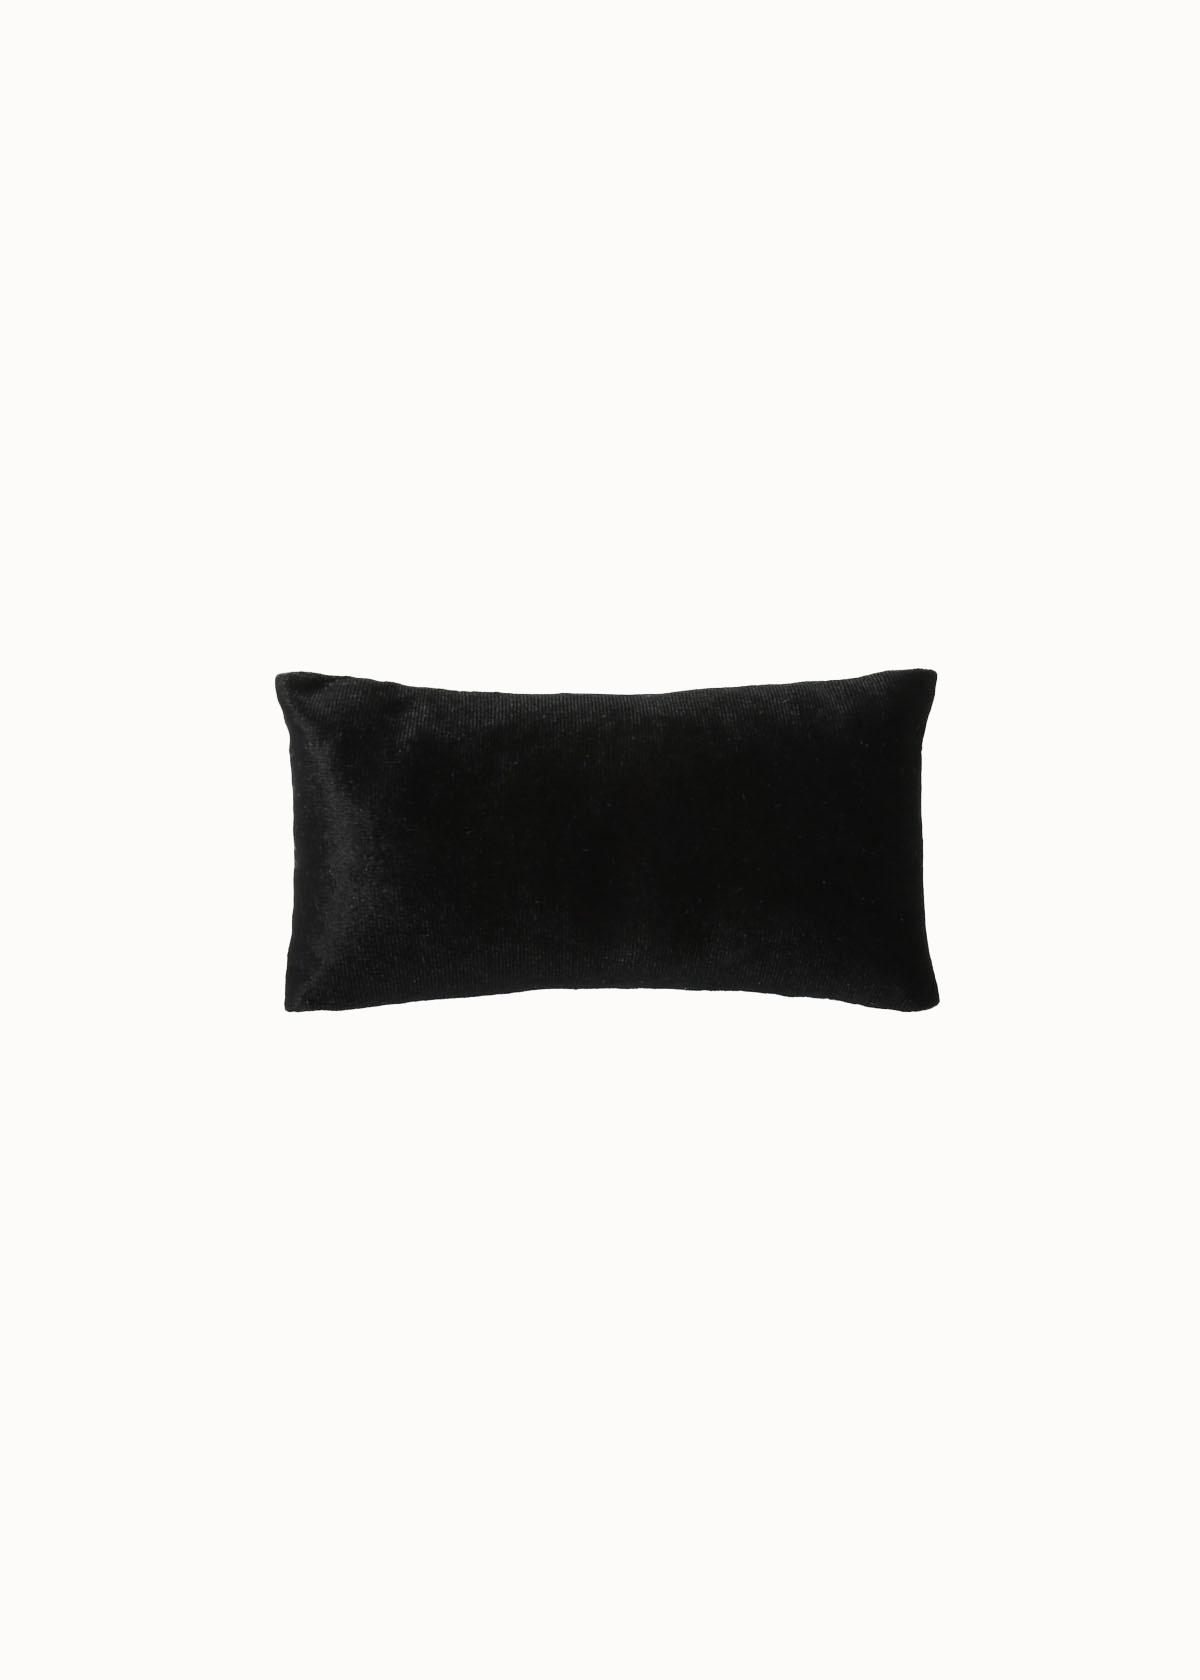 Armbanden display zwart